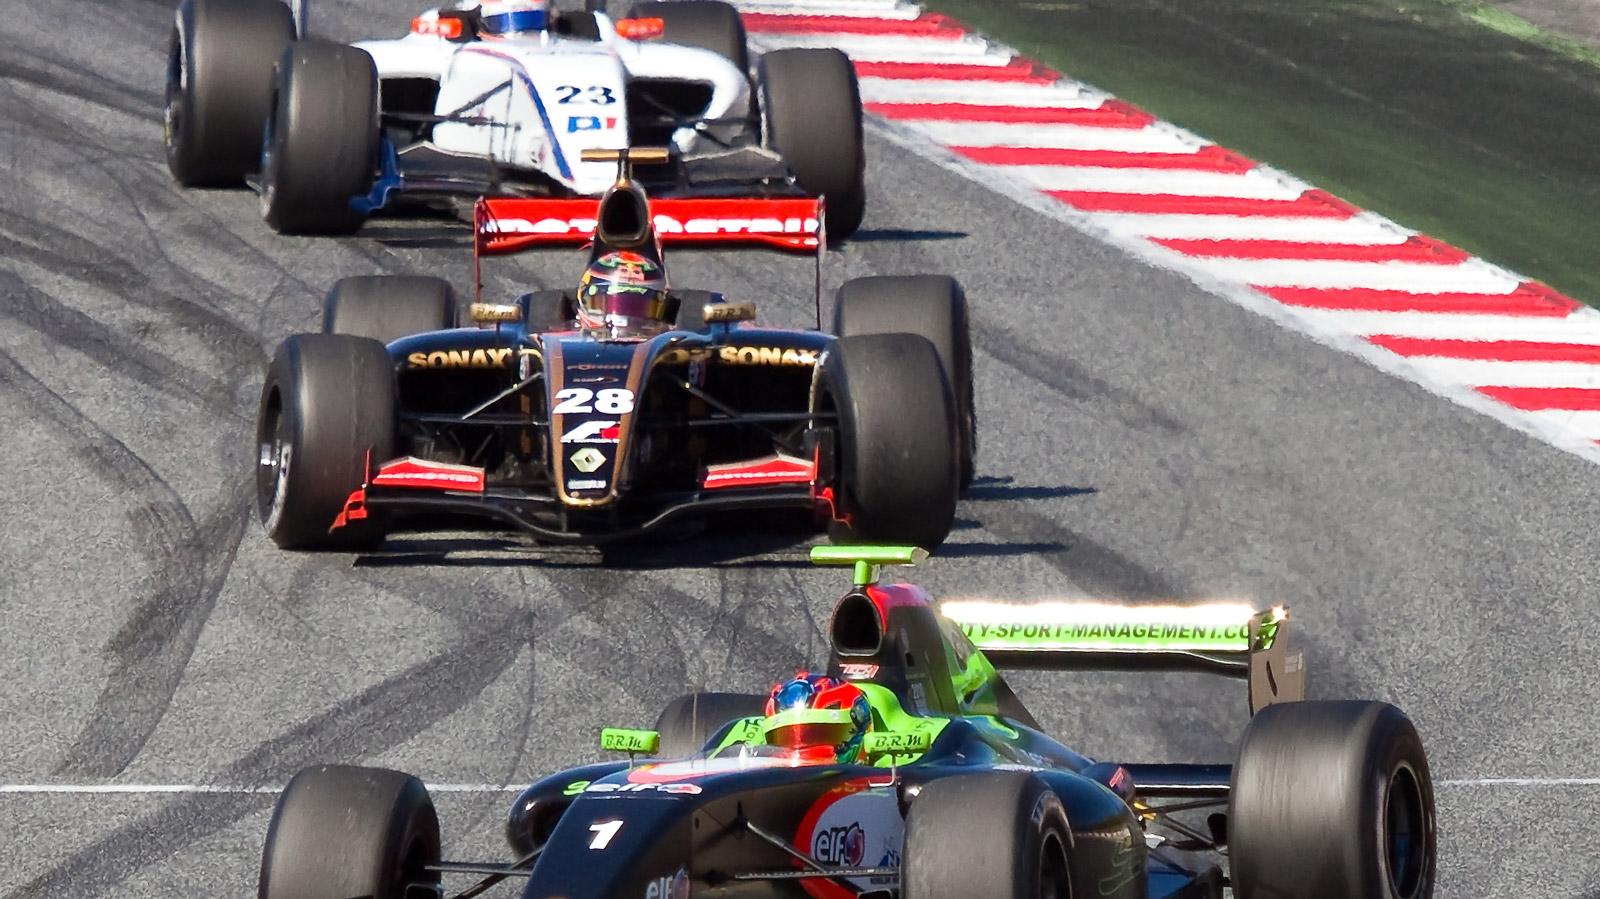 F1 sports bet cymru alliance bettingadvice